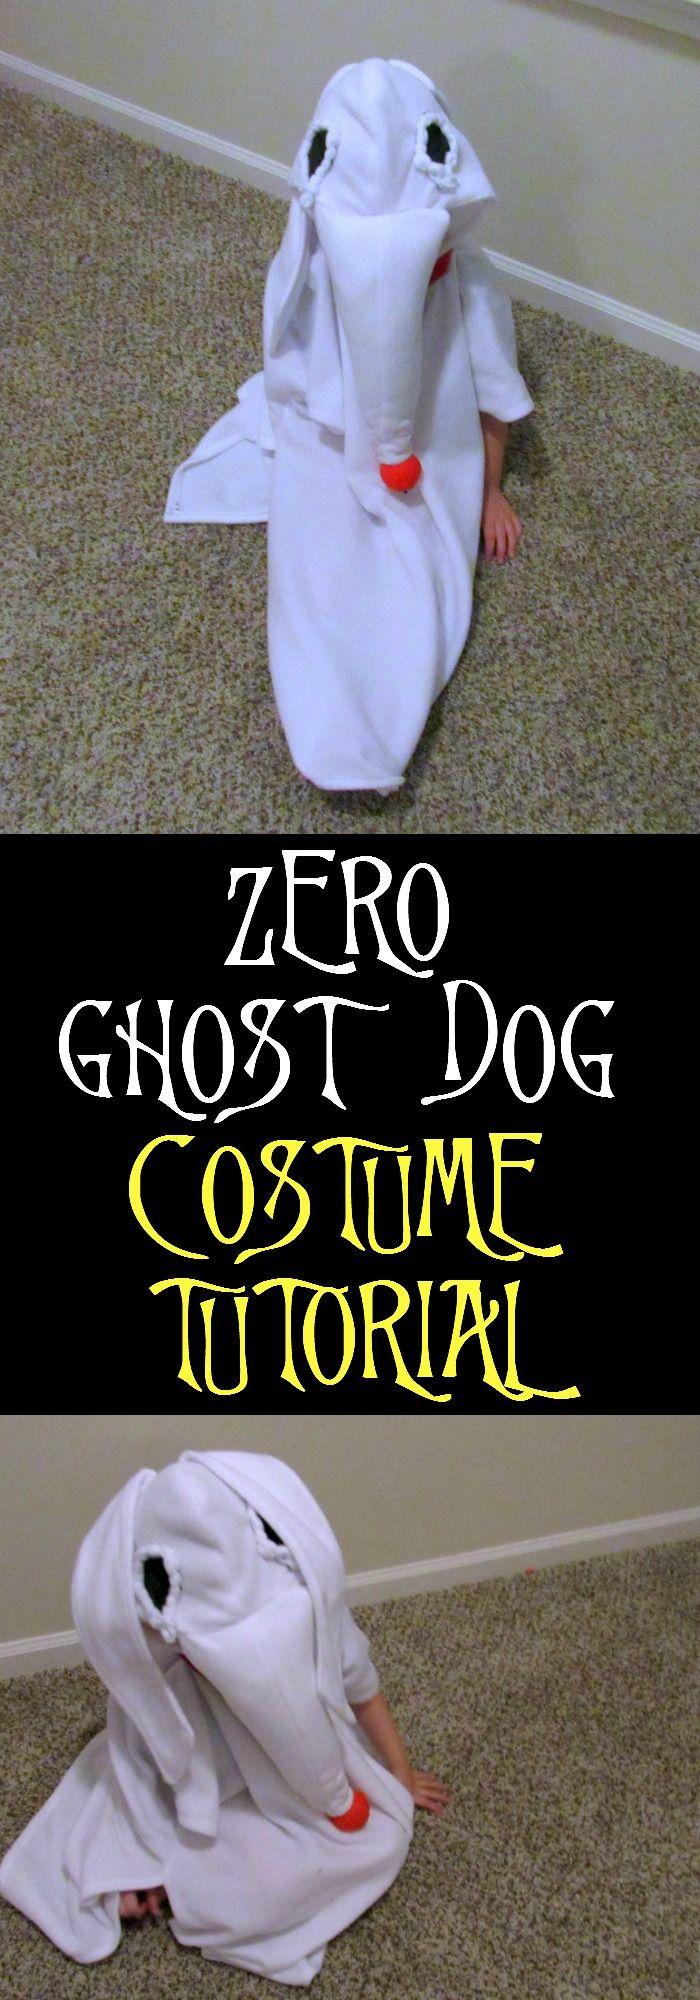 Zero Ghost Dog Costume Tutorial | Costume Ideas | Pinterest ...